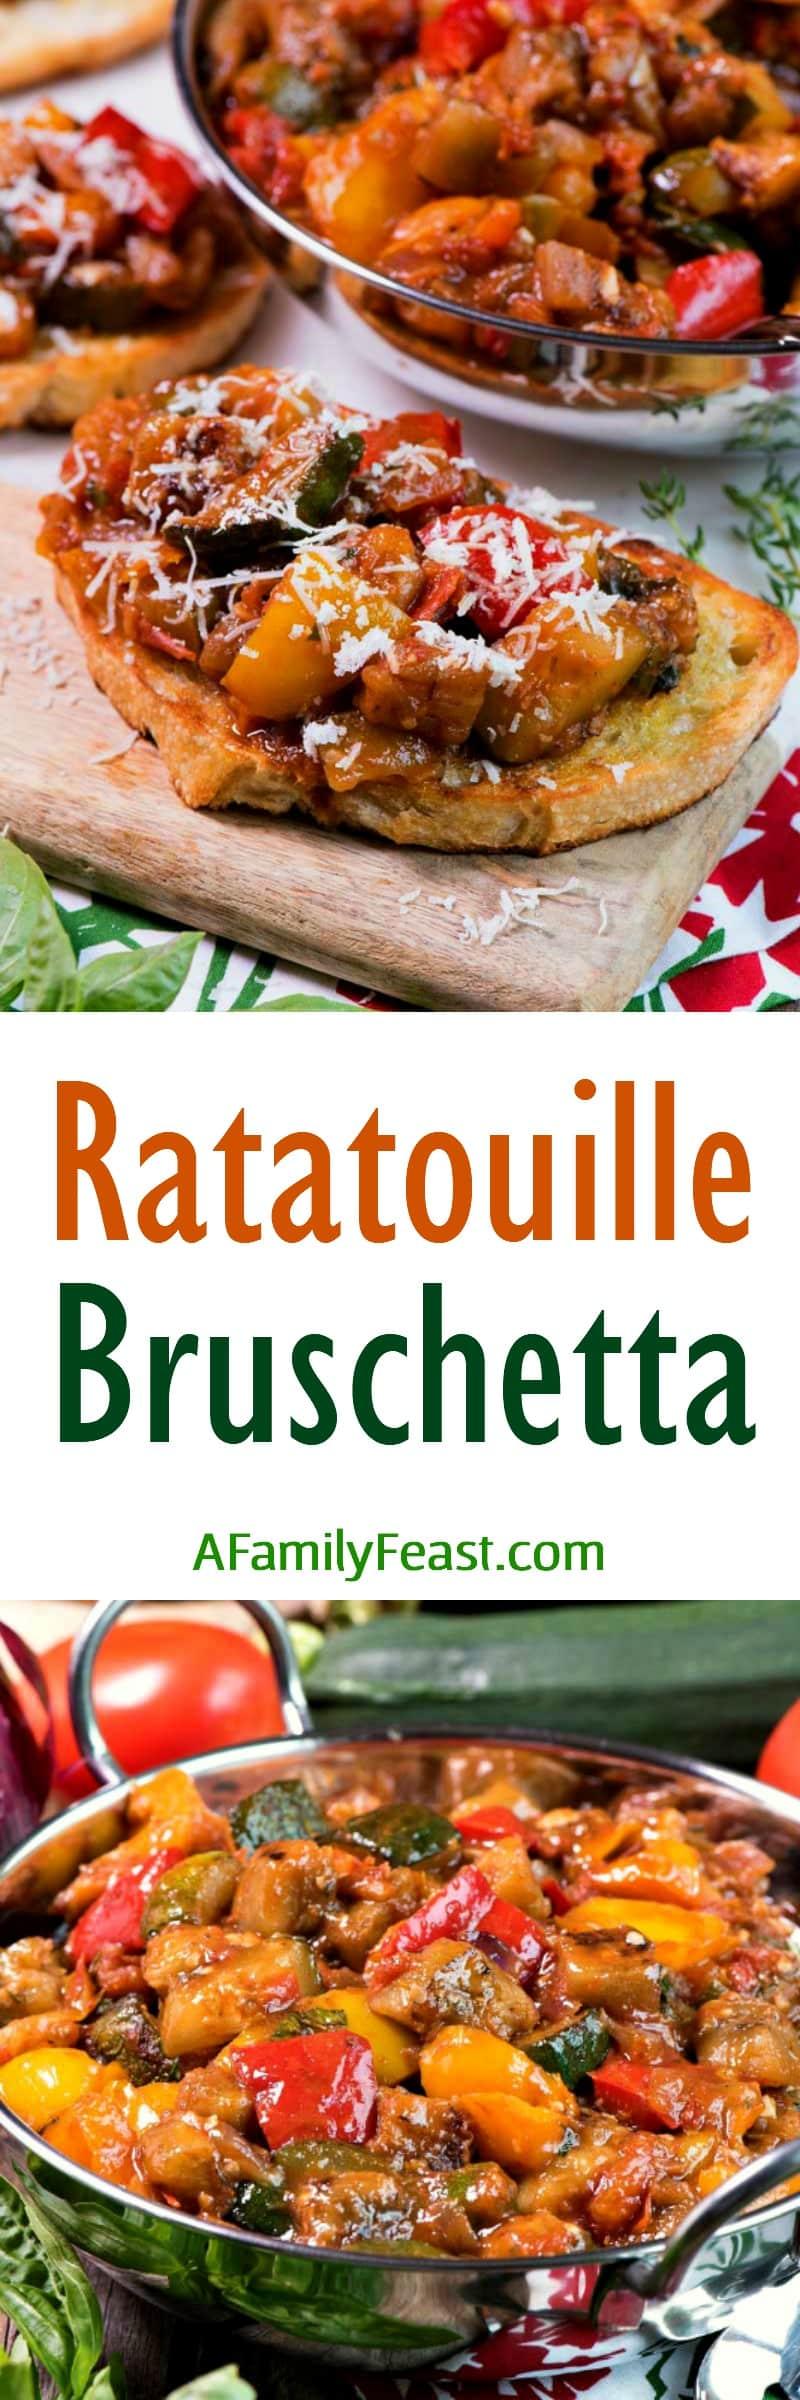 Ratatouille Bruschetta - A Family Feast